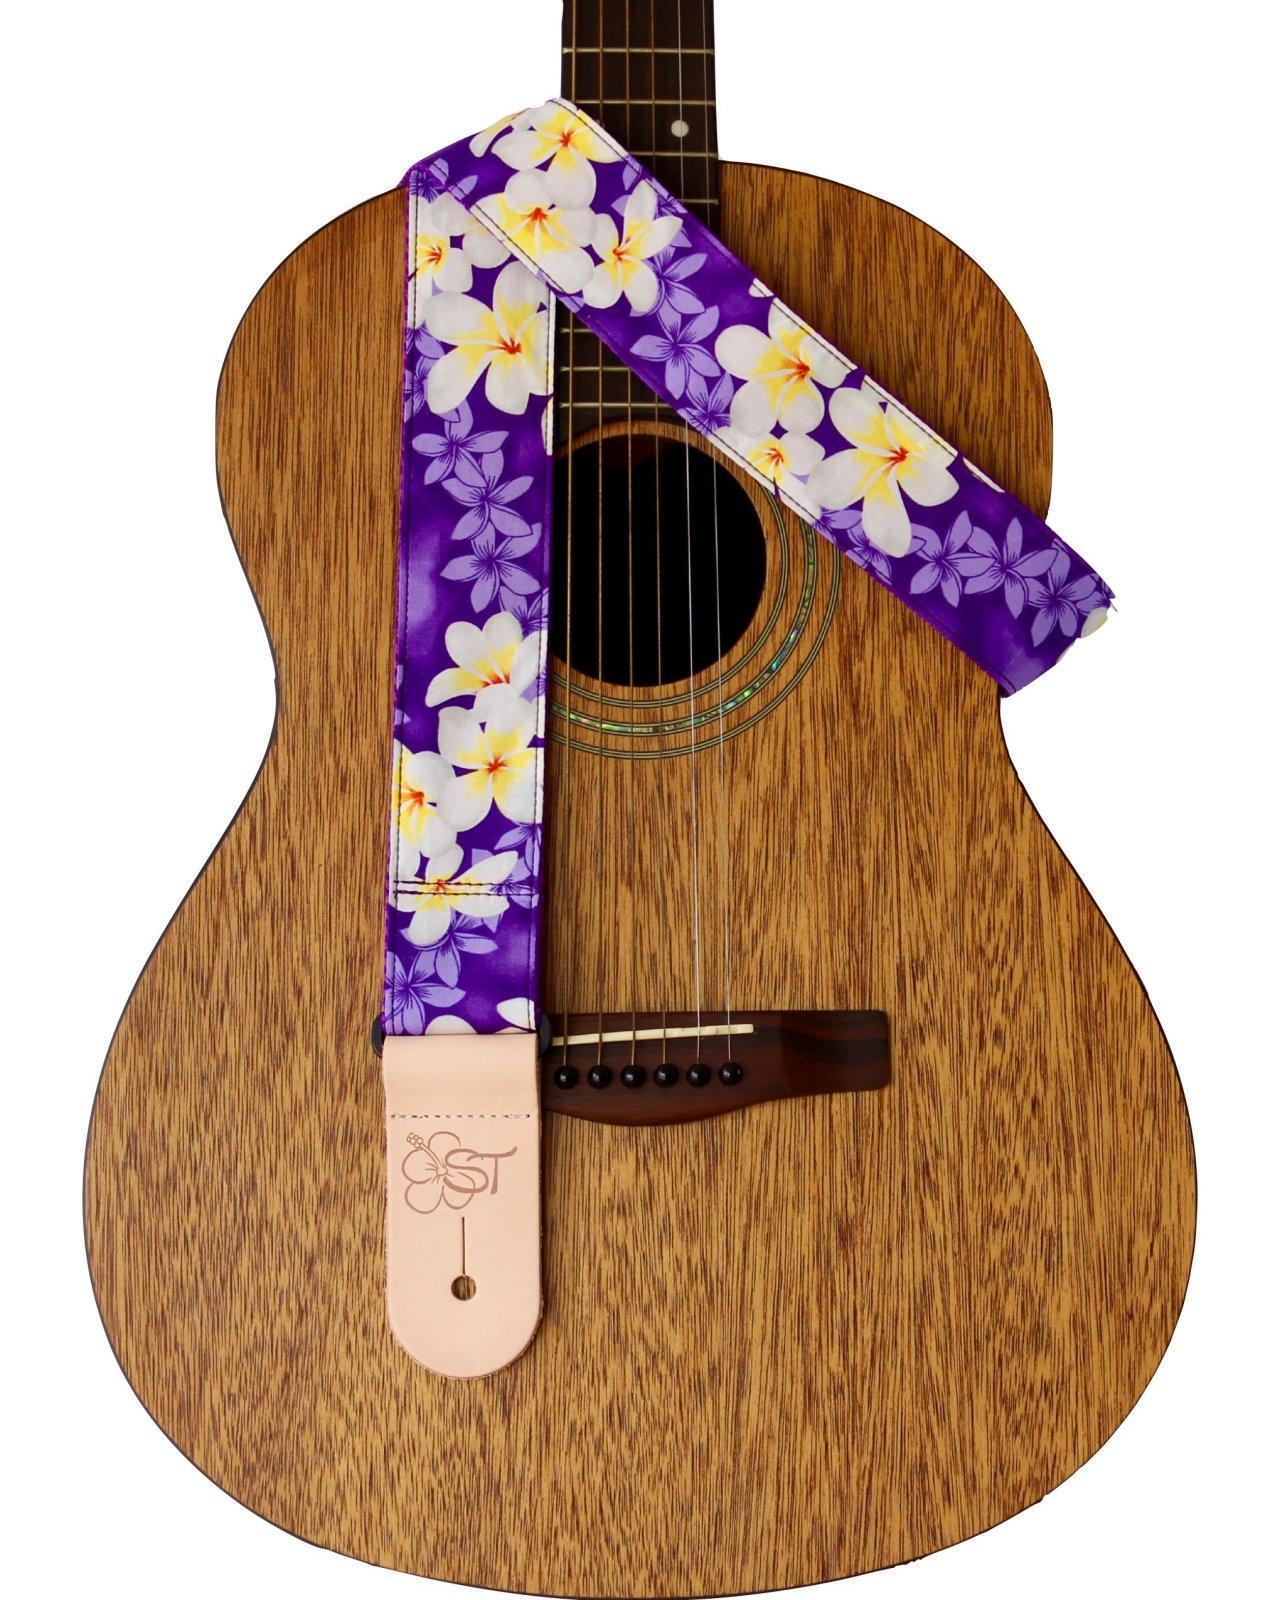 Sherrin's Threads 2 Hawaiian Print Guitar Strap - Purple Plumeria